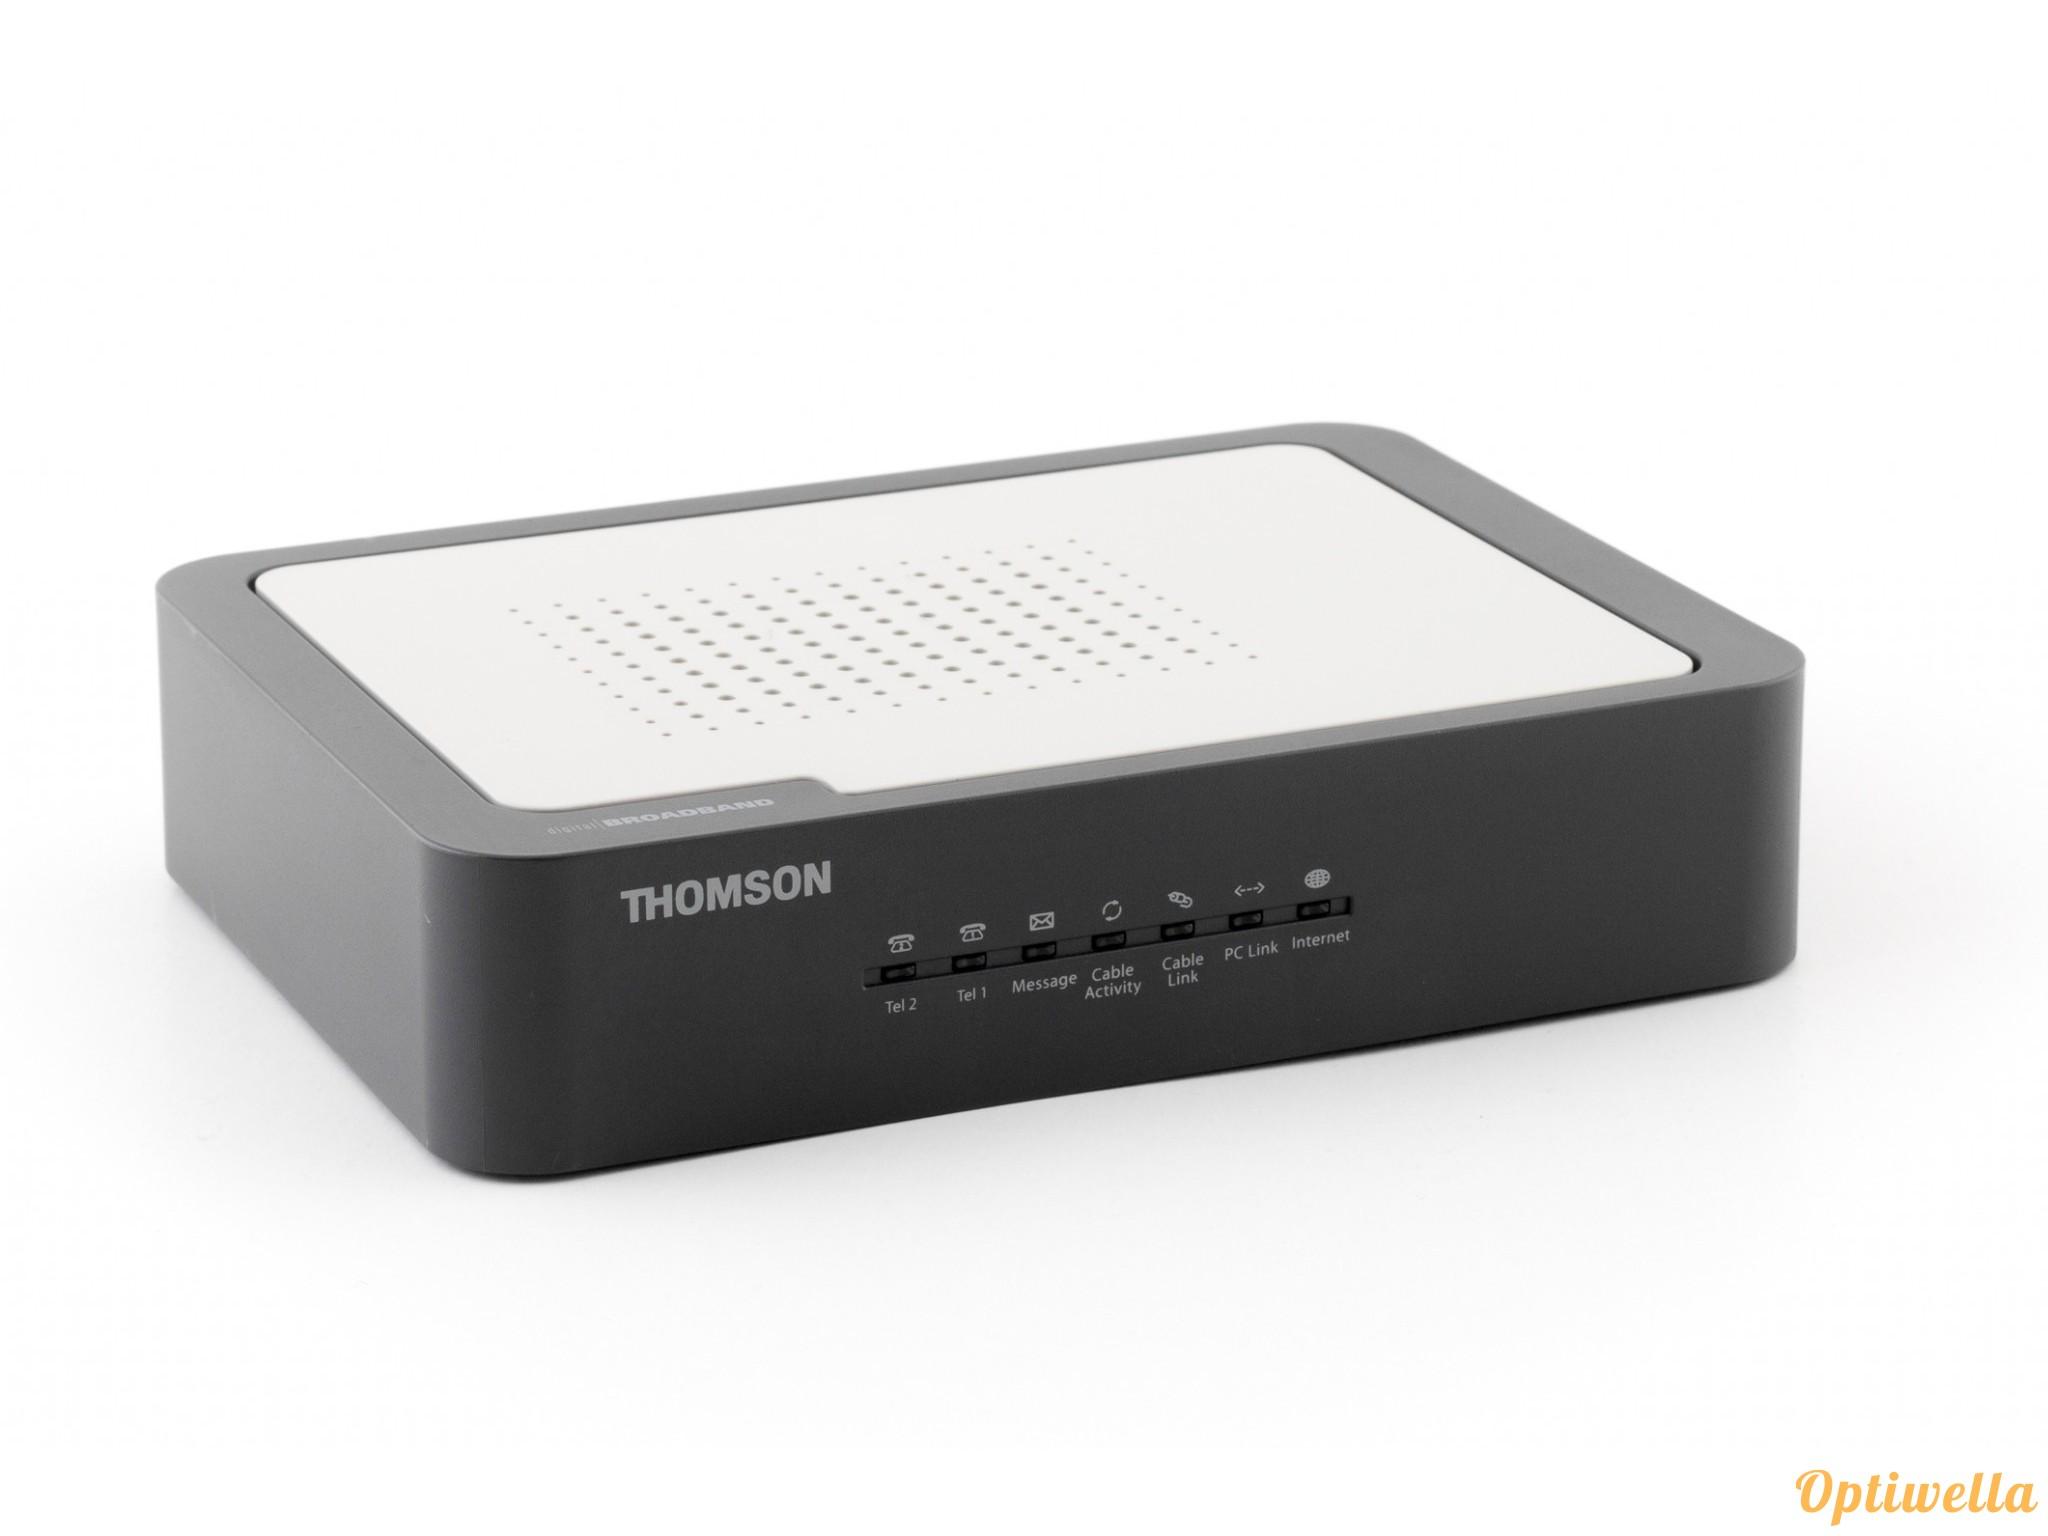 Thomson Thg540 Voice Over Ip Cable Modem Modem